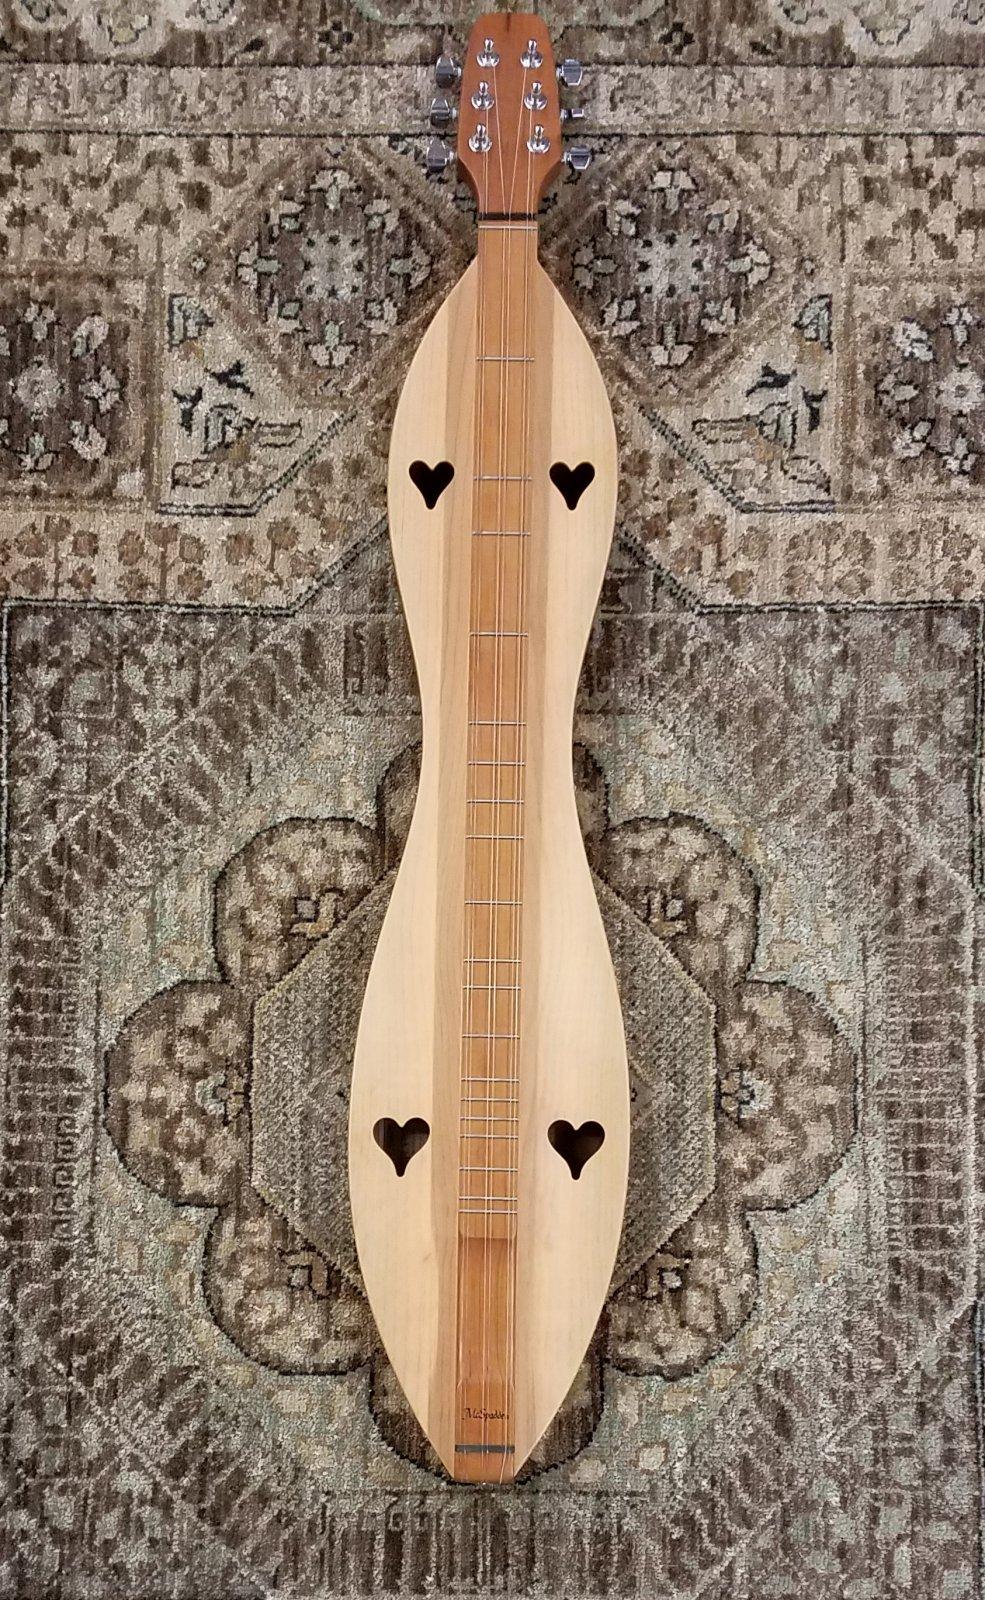 McSpadden 6FHCS 6-String Dulcimer, Spruce Top Cherry Back/Sides